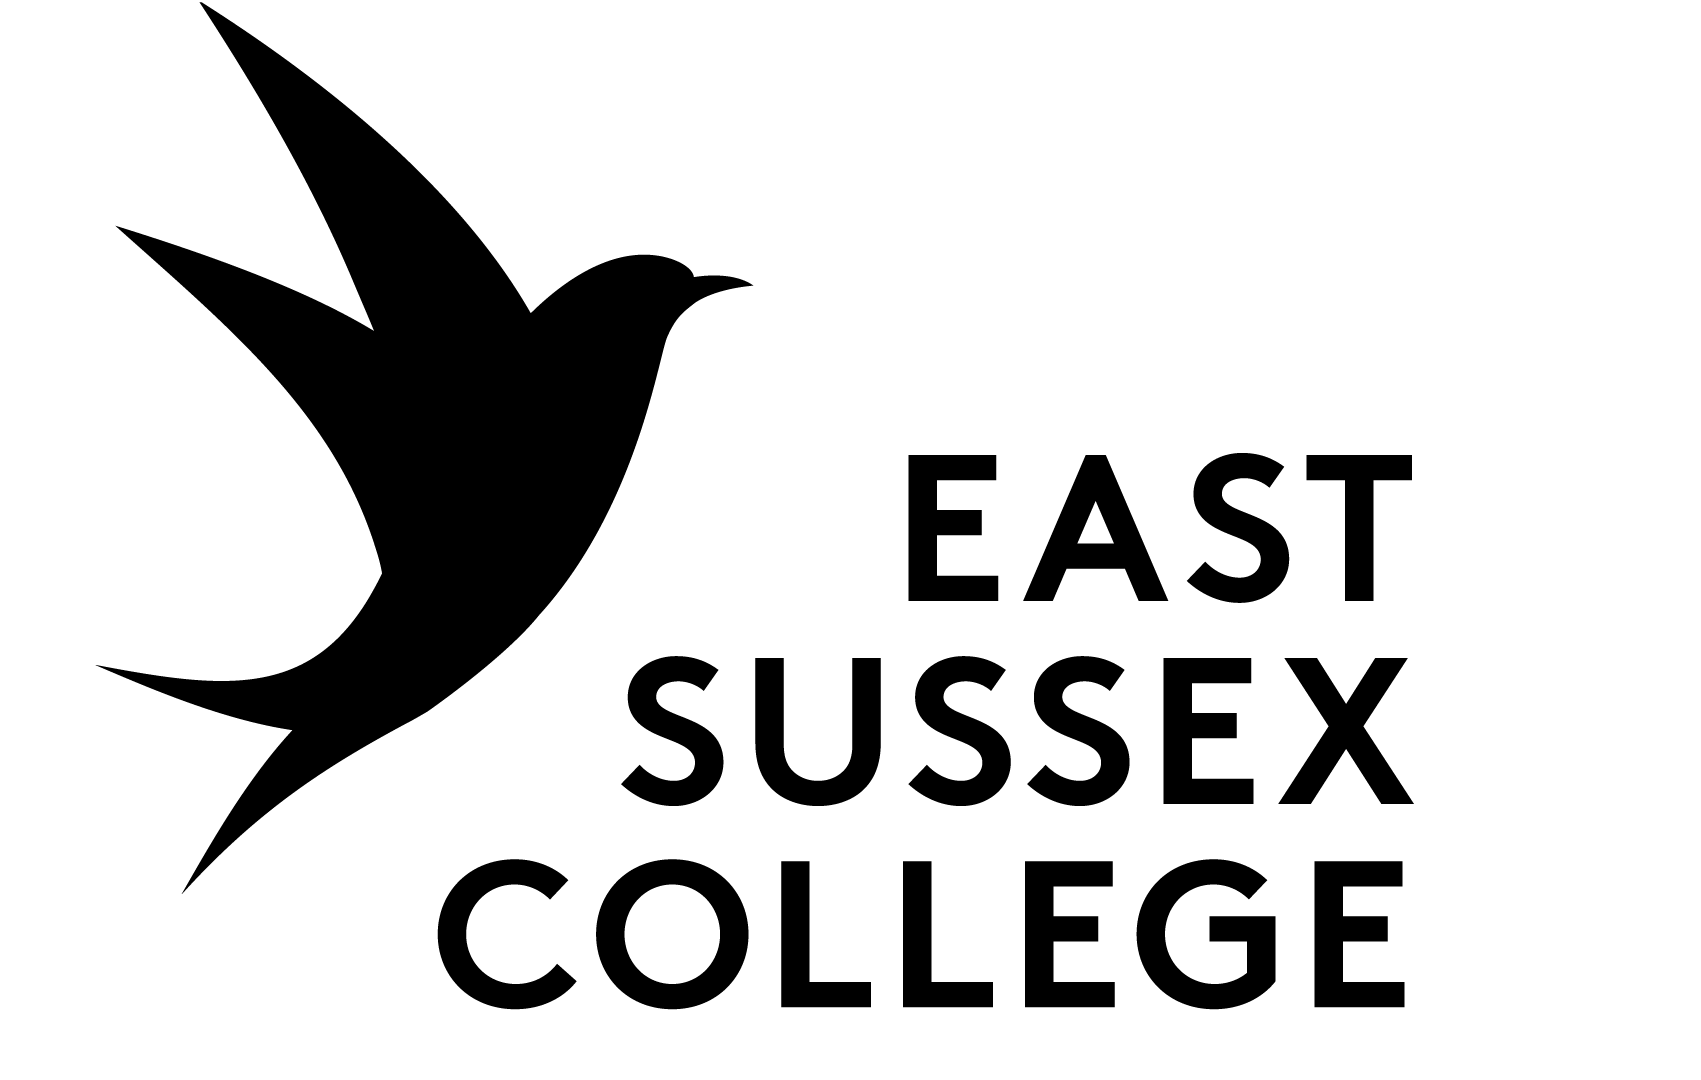 escglogostackblack2020_1701